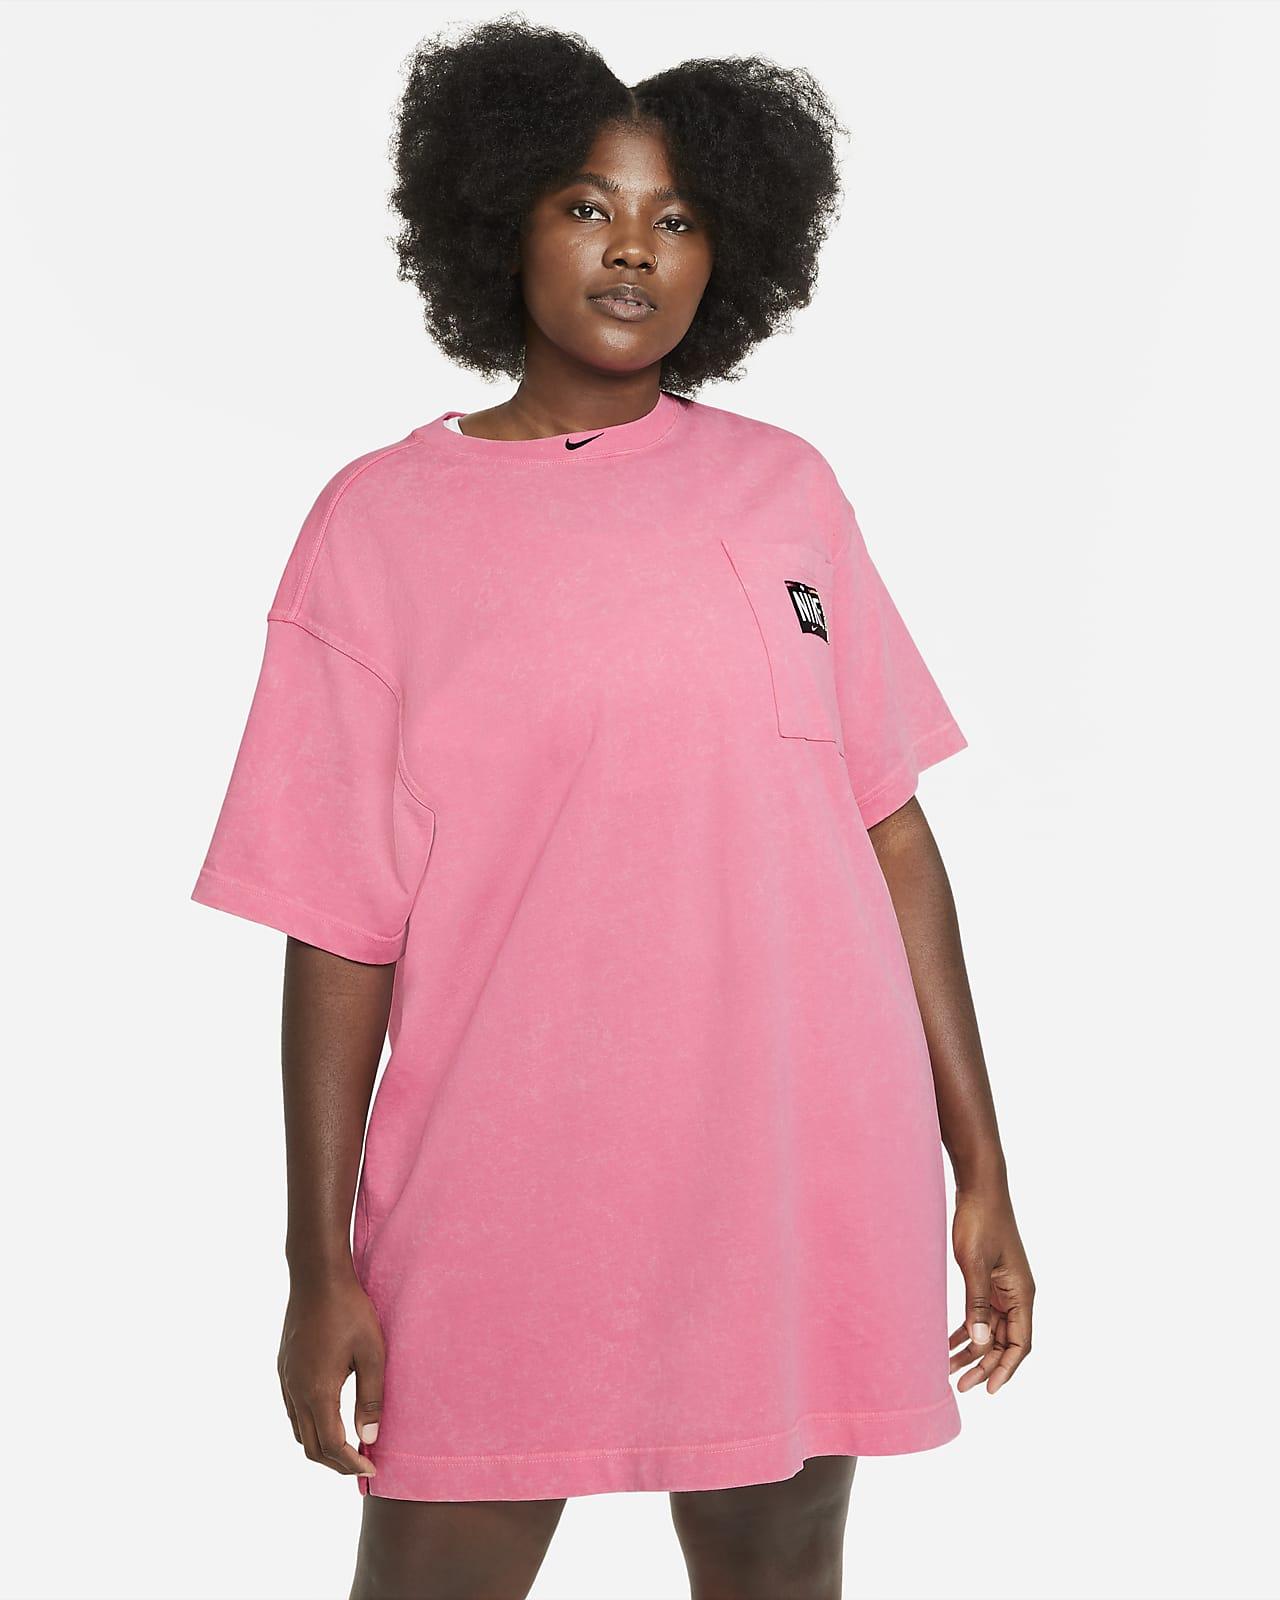 Платье Nike Sportswear (большие размеры)